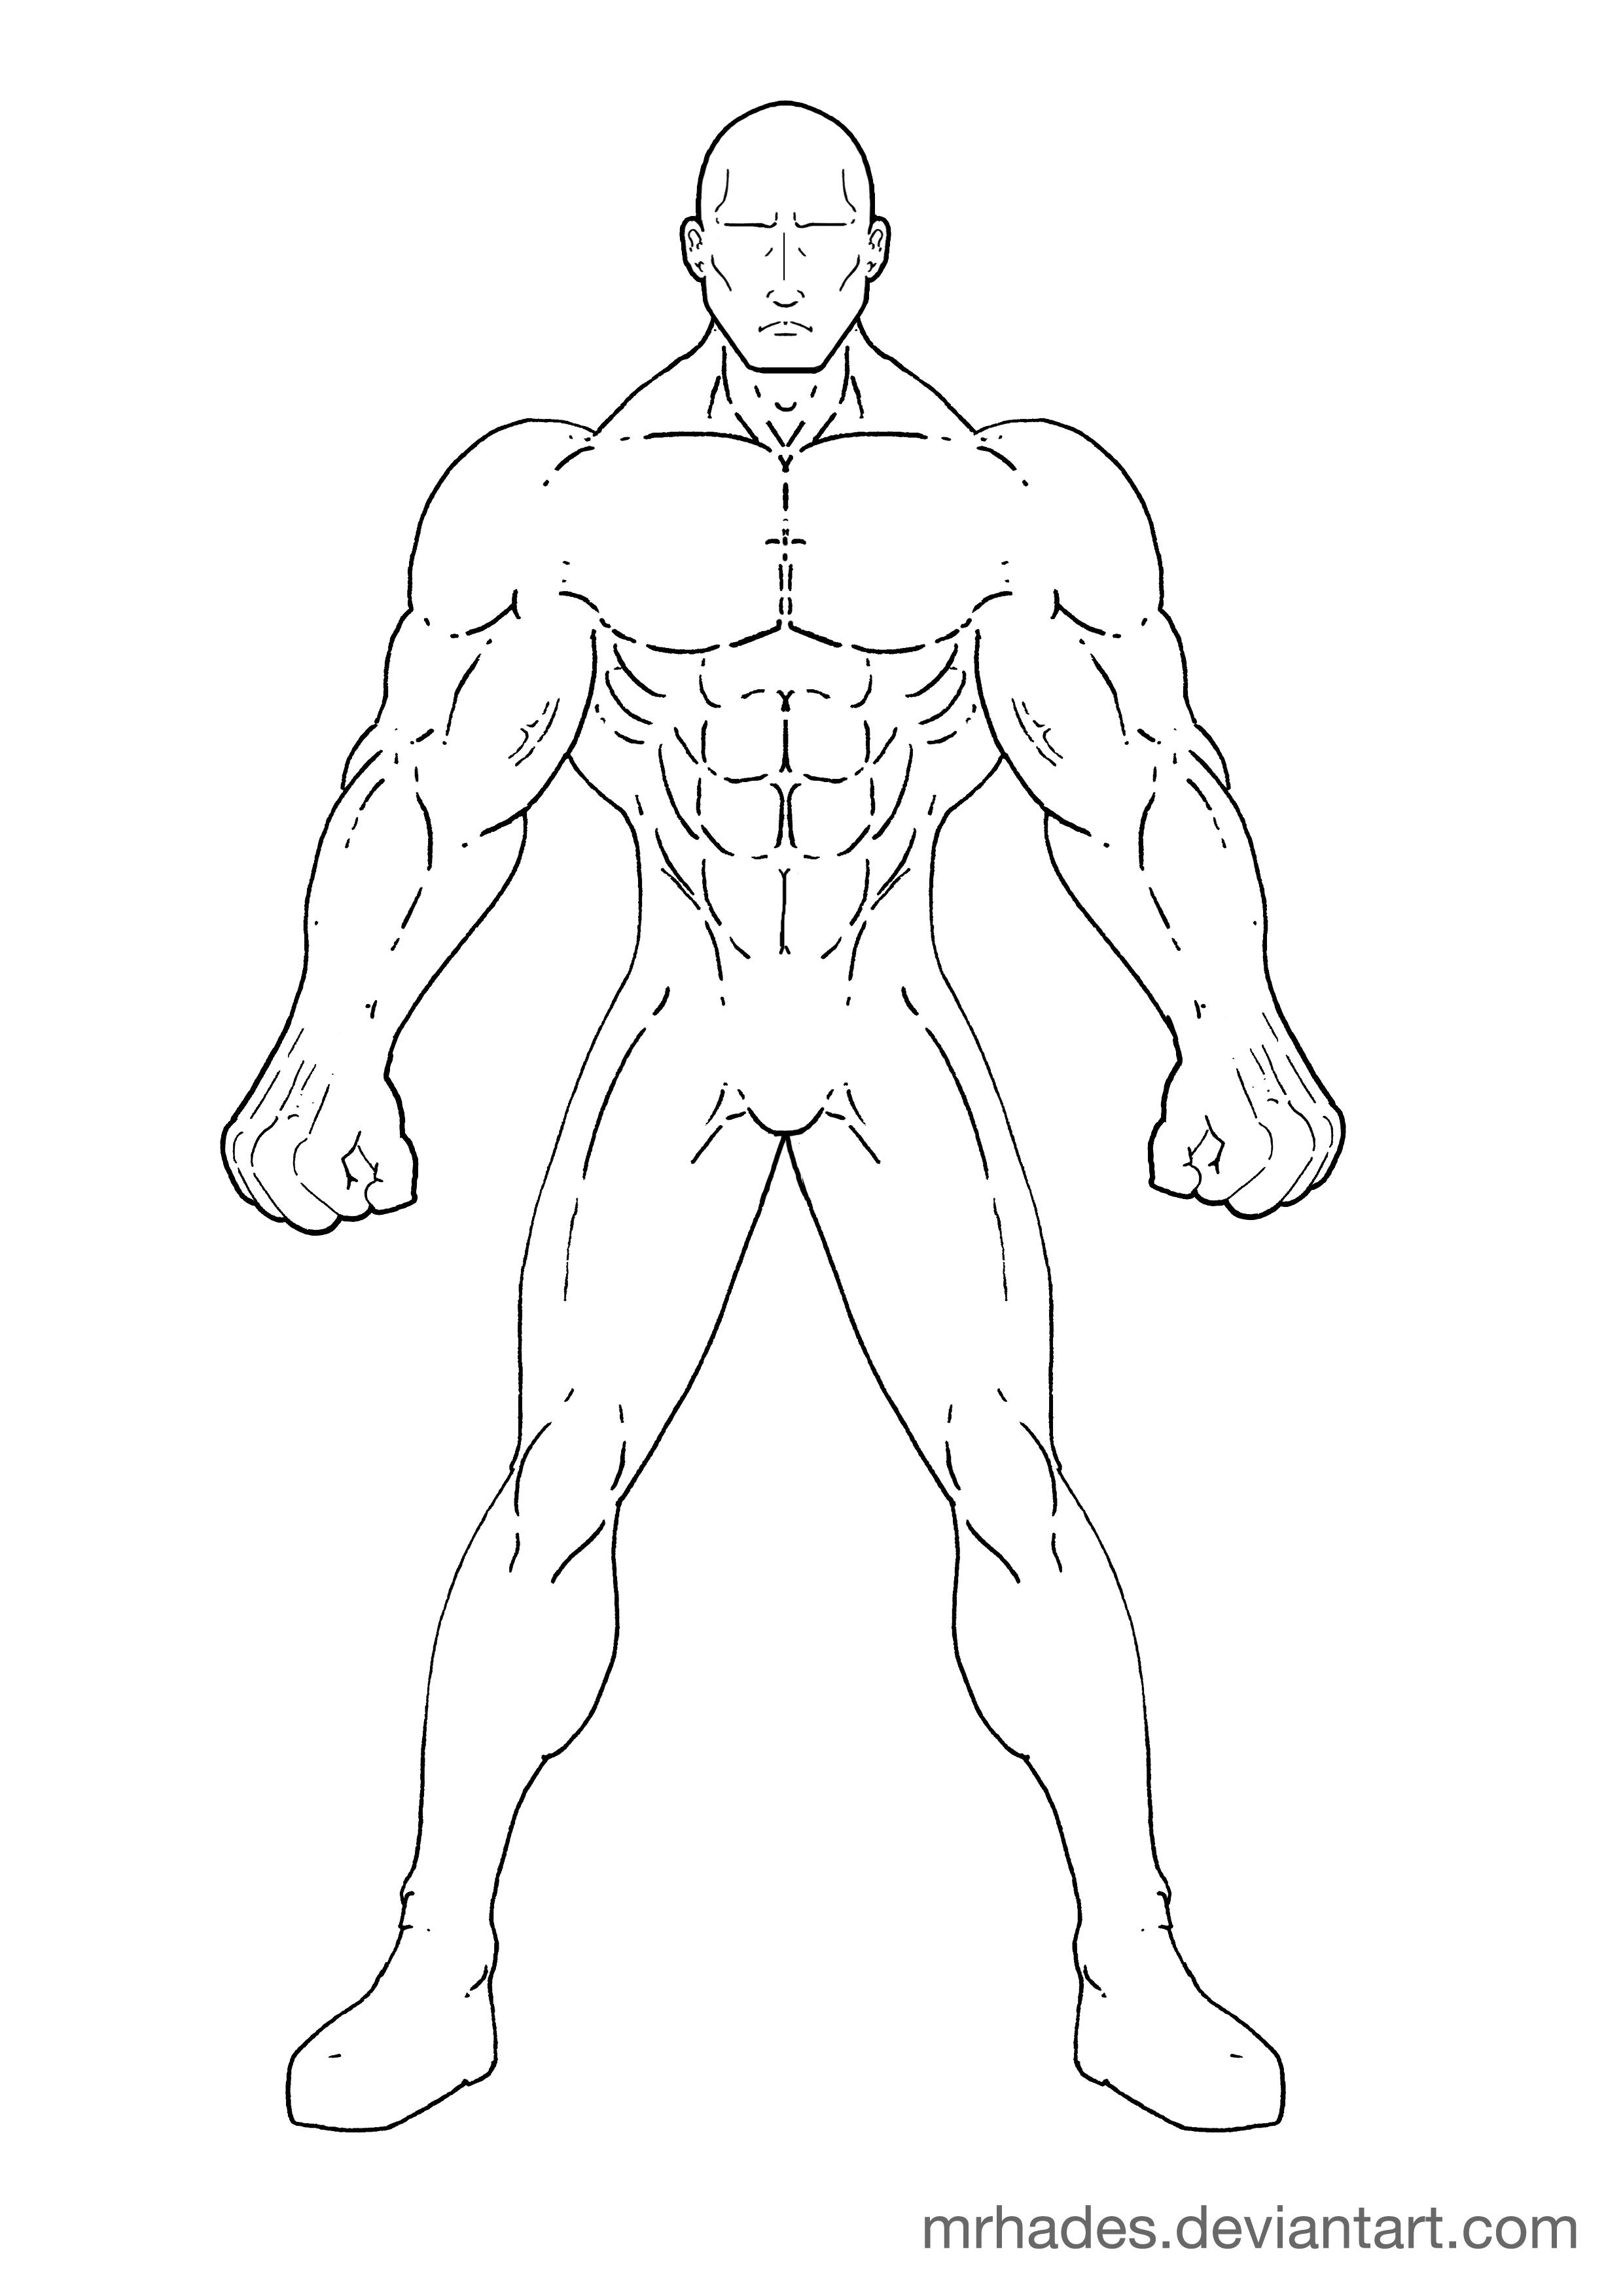 Muscled Man Template Vanguard